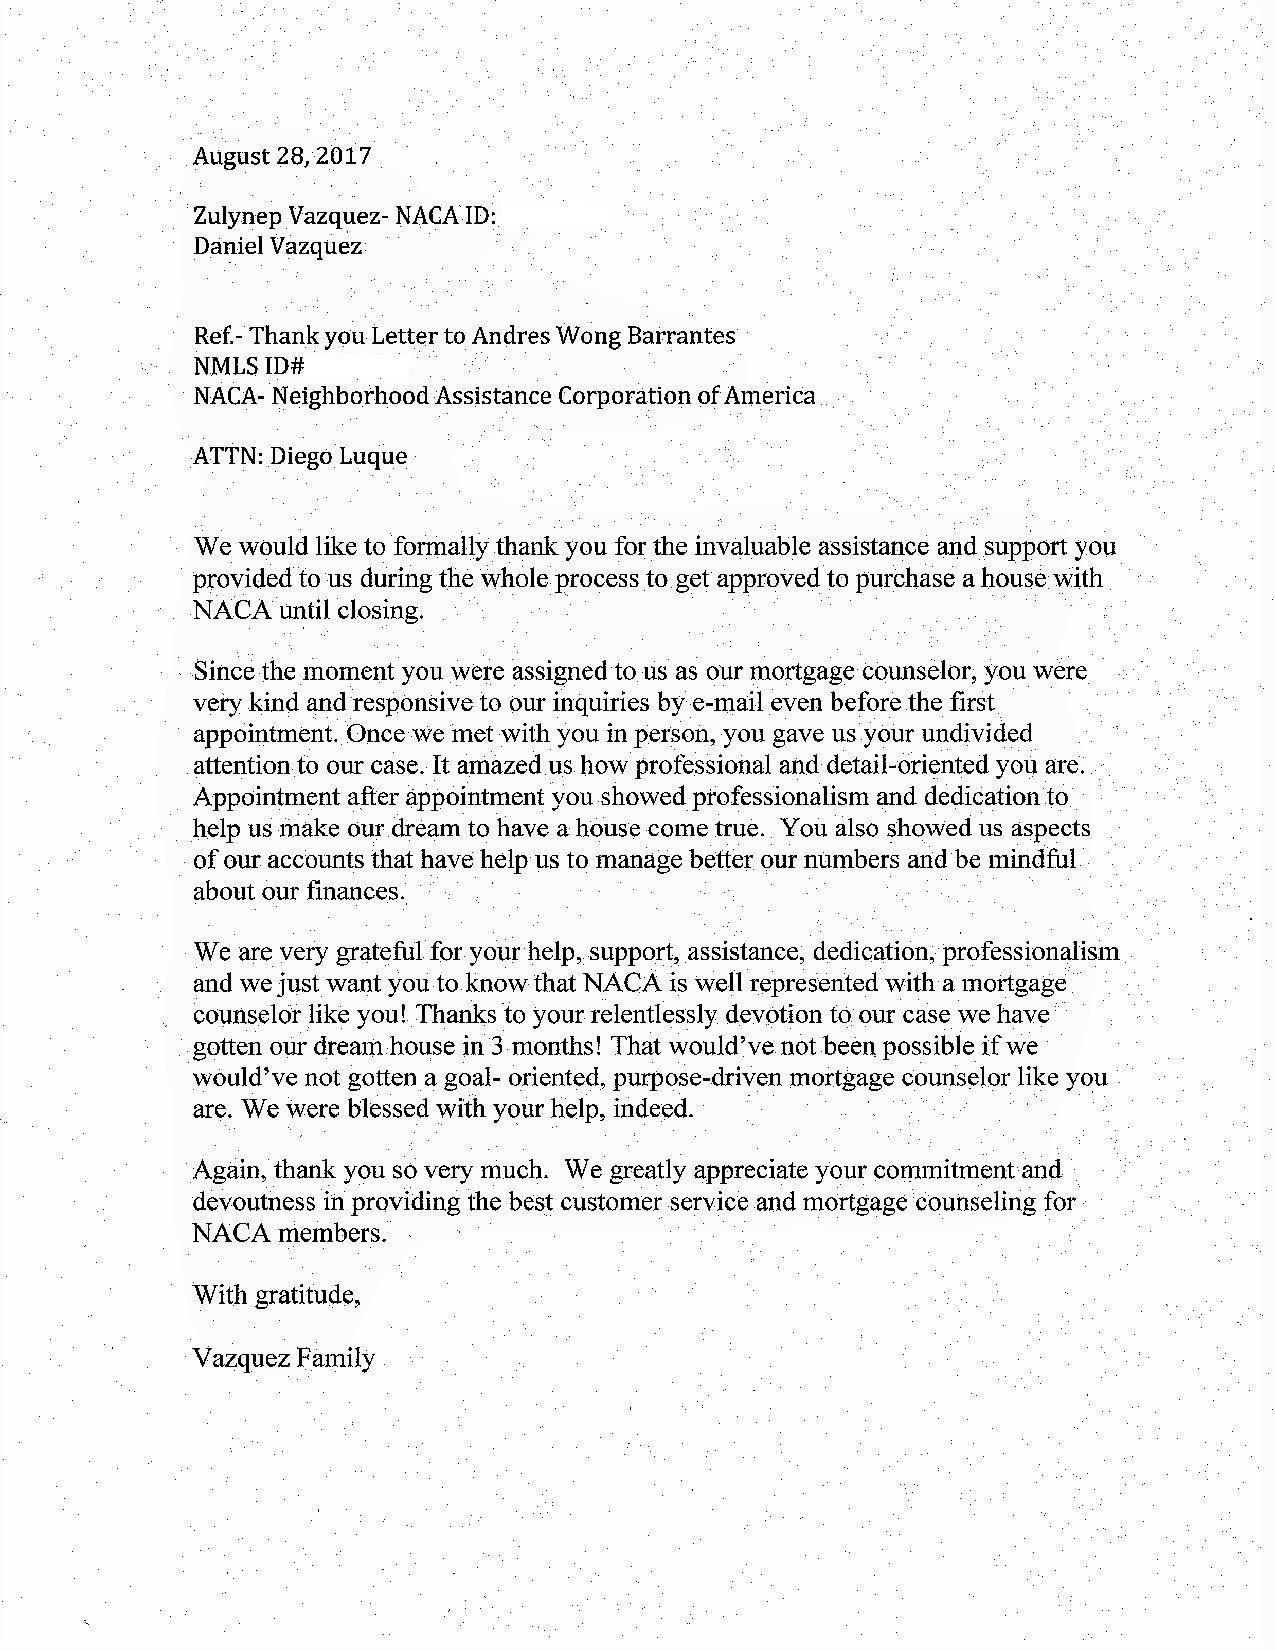 Atlanta Nacapurchase Counselor Andres Wong Barrantes Received